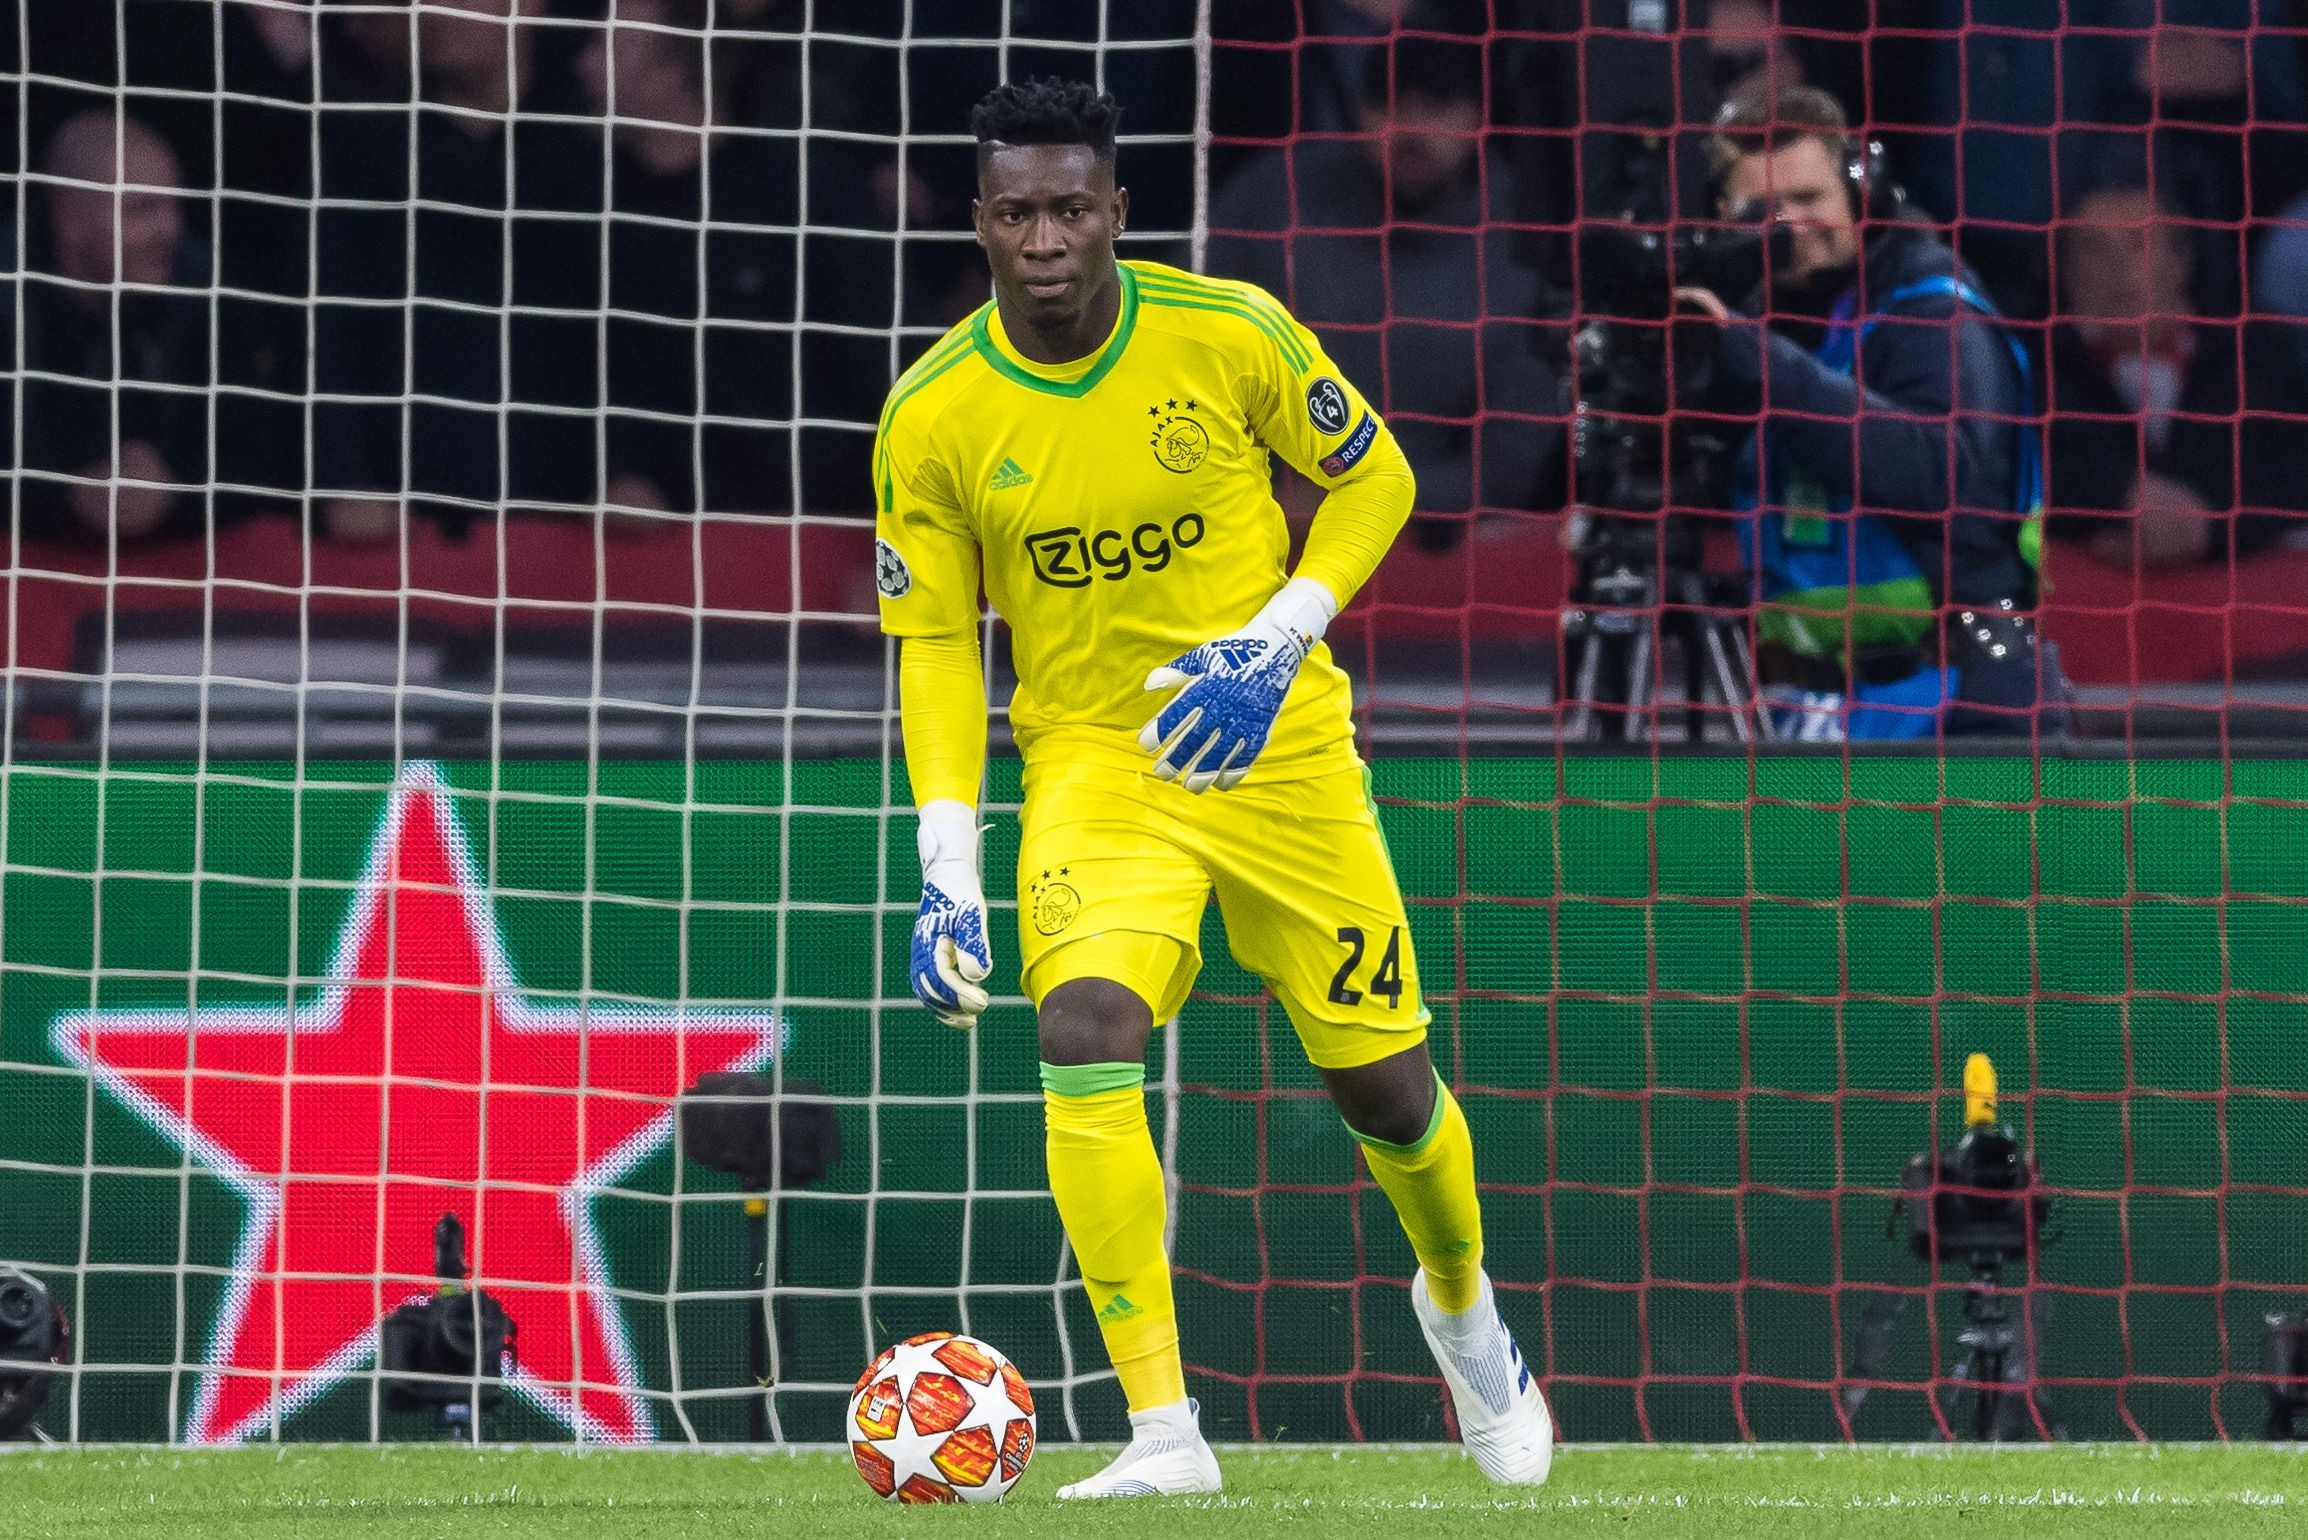 Andre Onana lors de Ajax - Juventus en Ligue des champions le 10 avril 2019